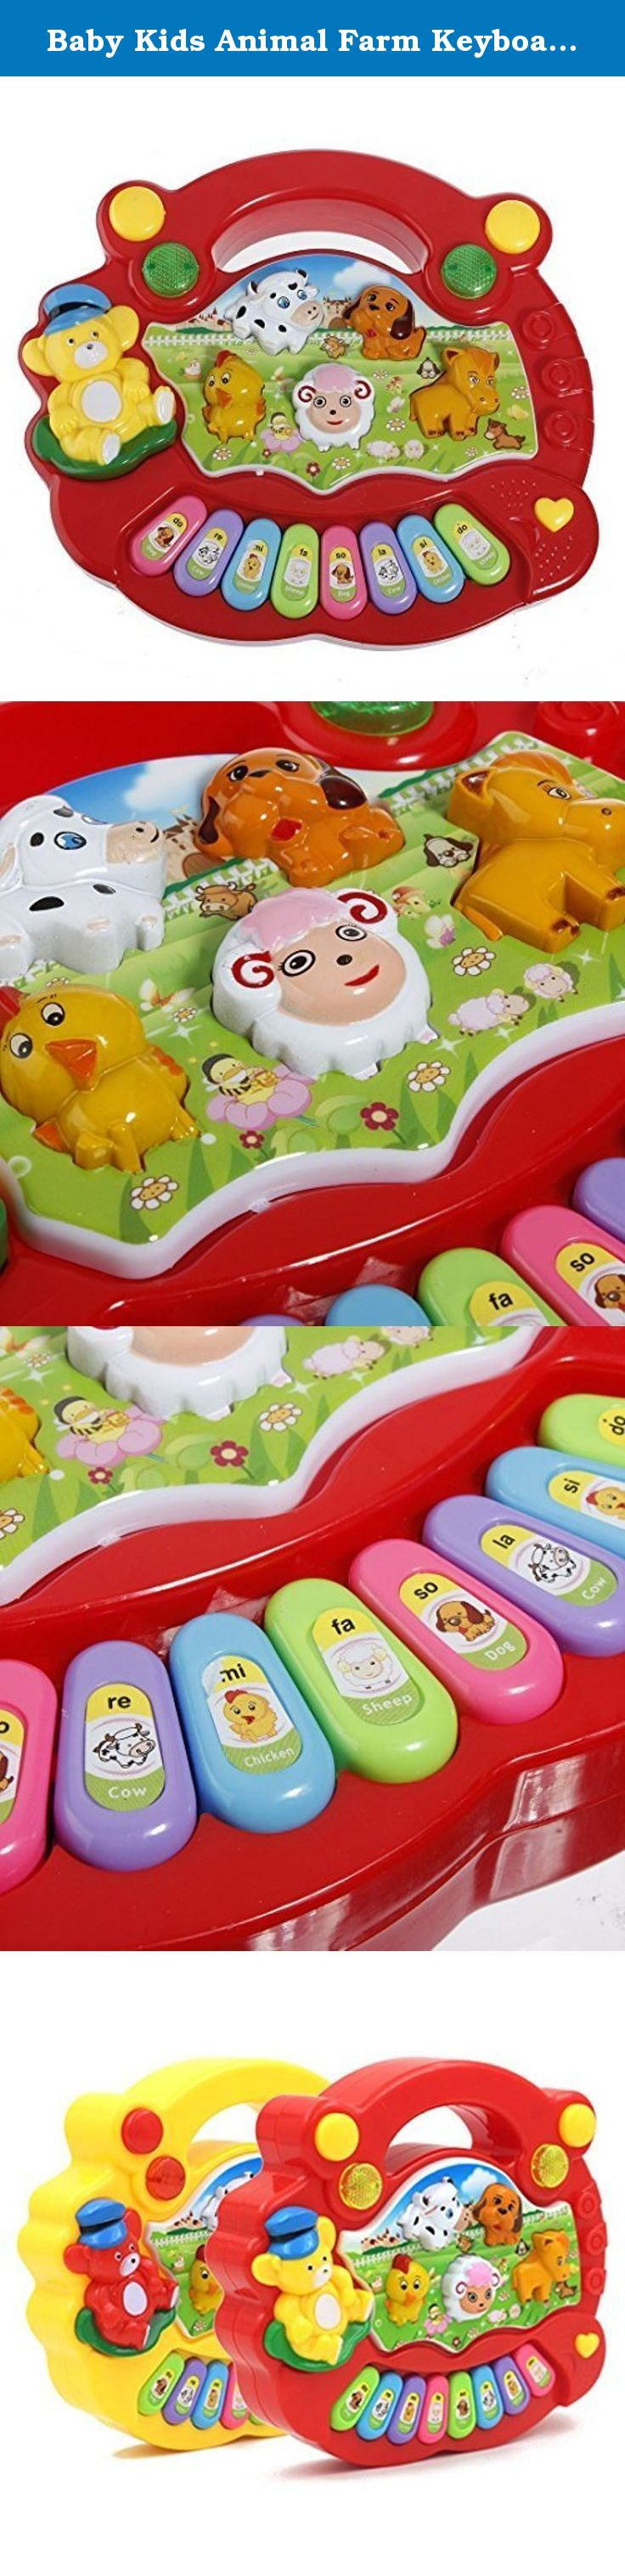 2f5dff0dd04d Baby Kids Animal Farm Keyboard Electrical Piano Child Musical Toy.  Description   Baby Animal Farm